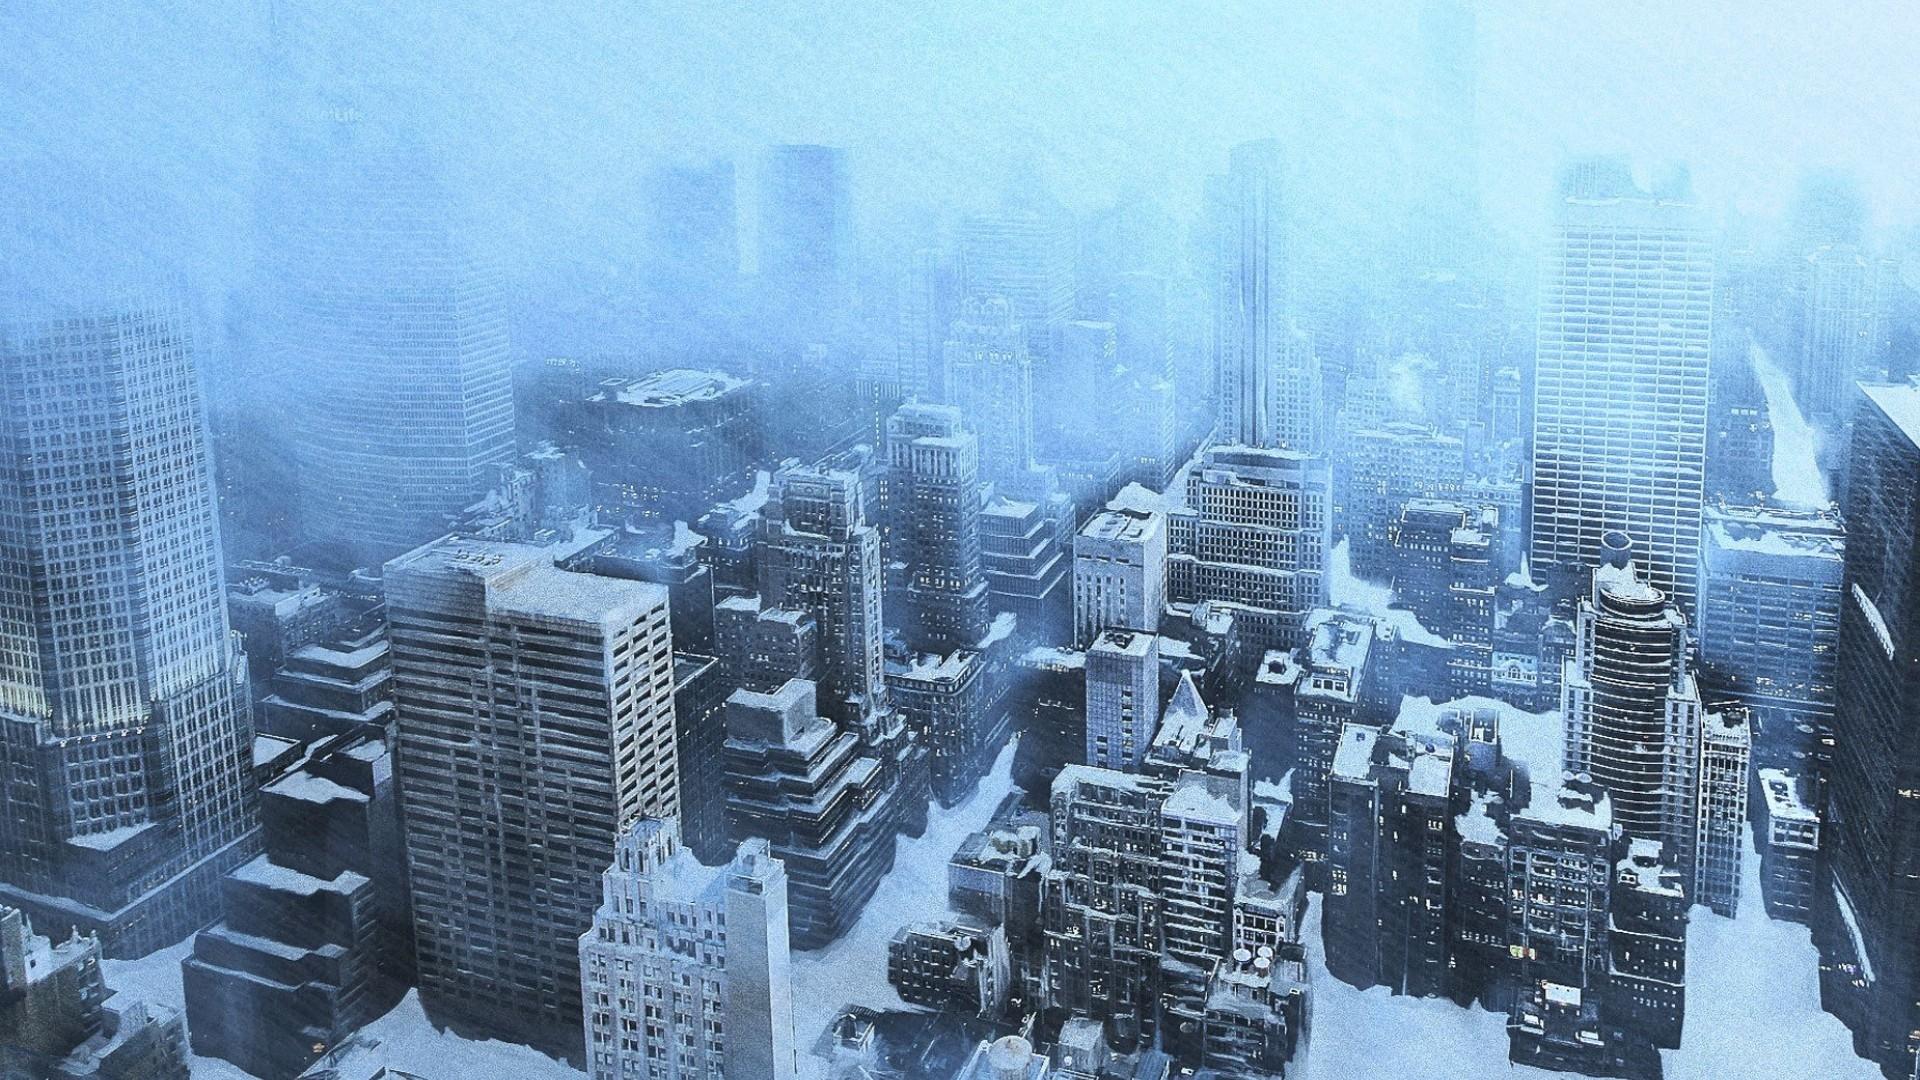 Snow falling on skyscrapers, New York City: